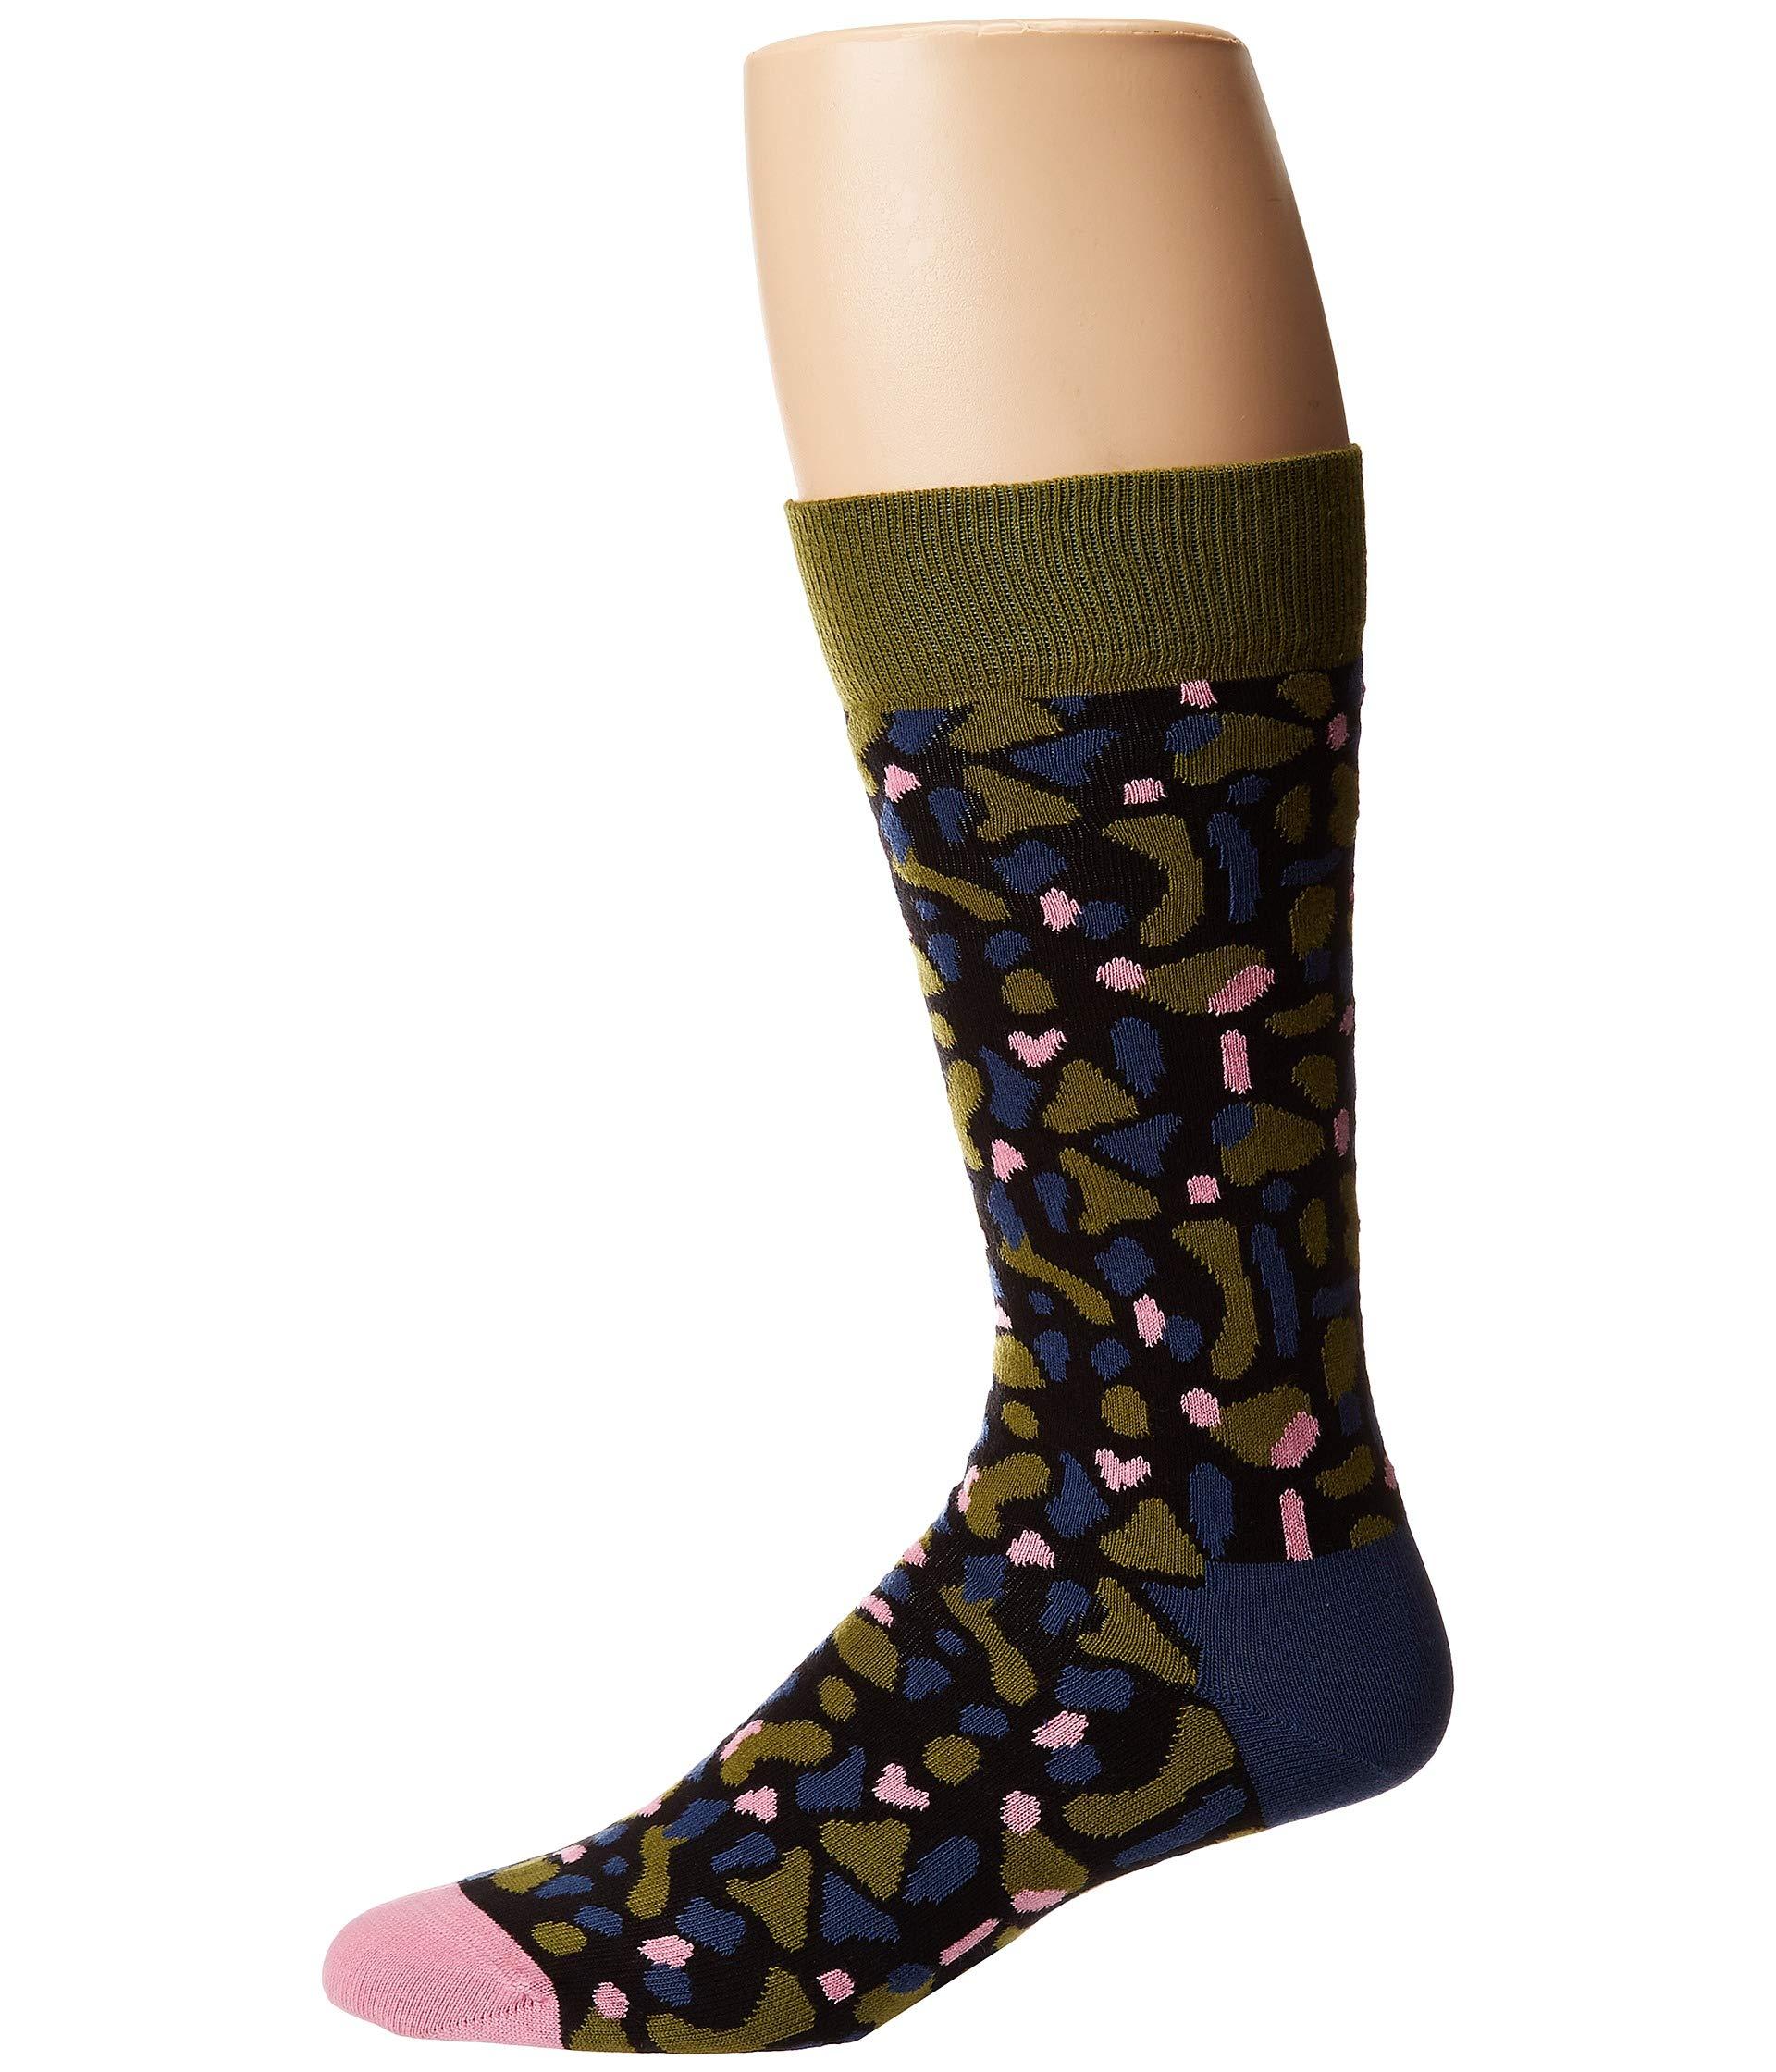 Blue Limit Happy Sock Socks Wiz Khalifa green No xwZZPYIHnq